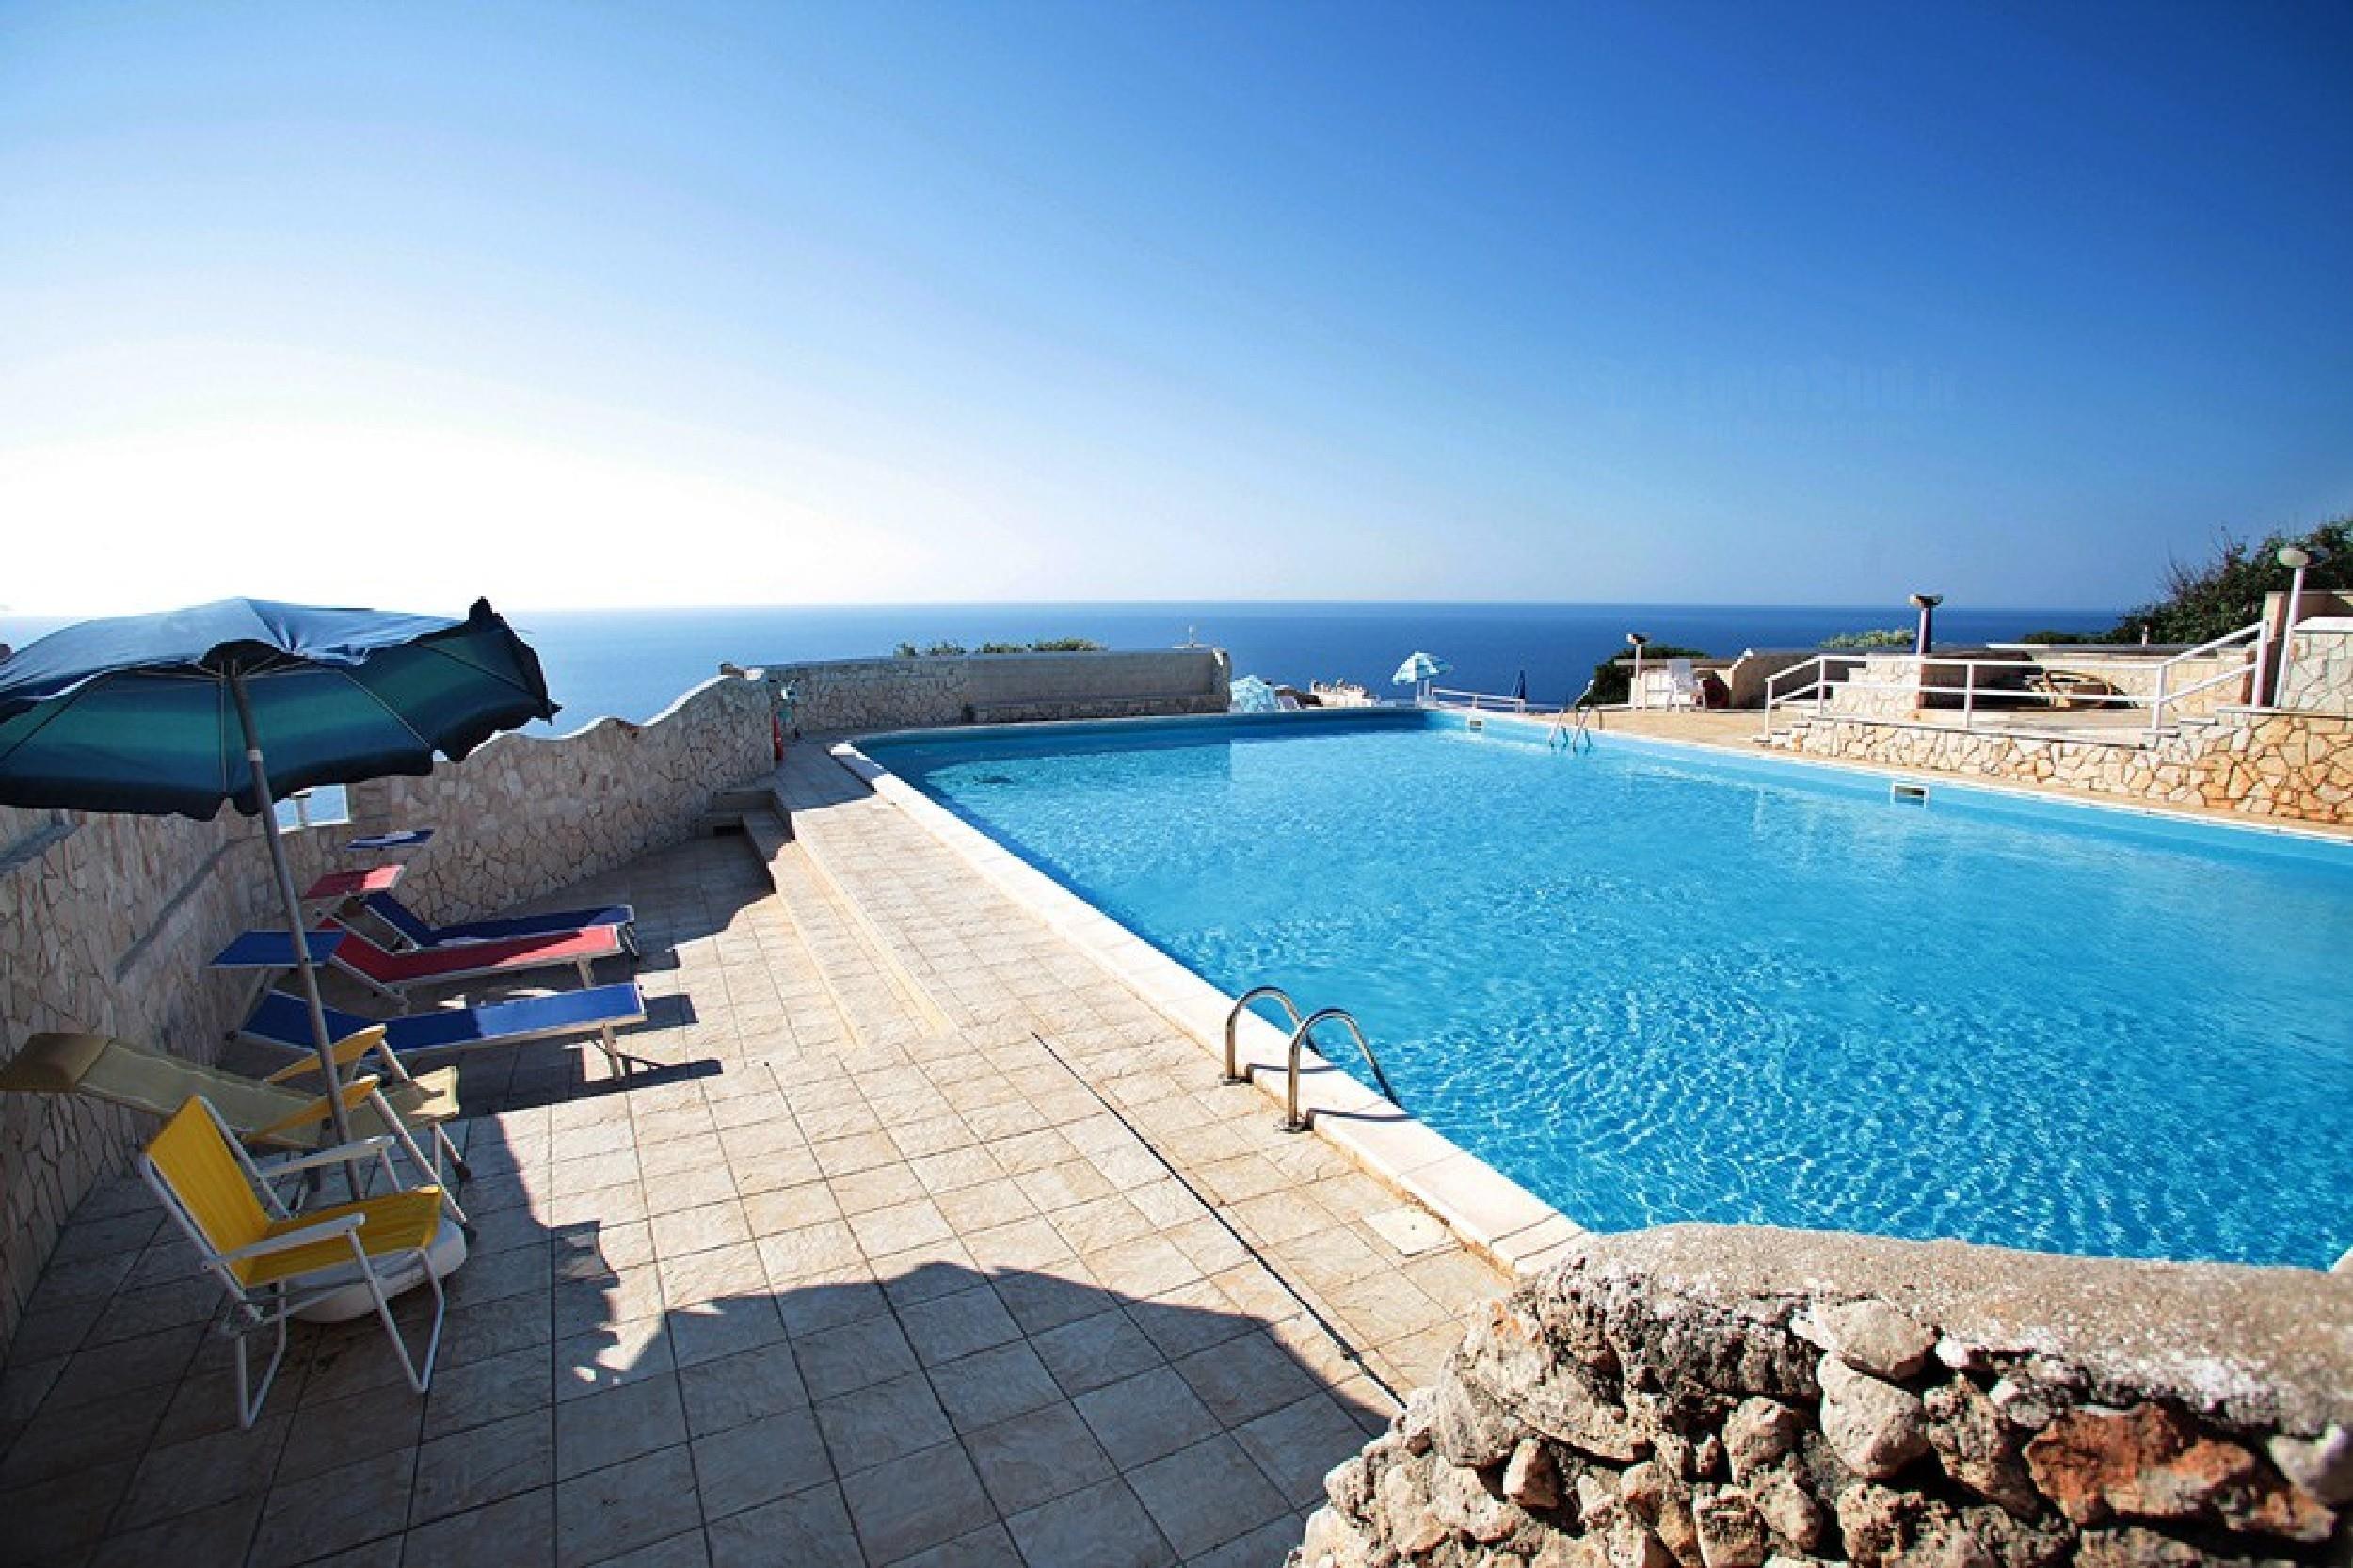 Archetti pool residence photo 22460062